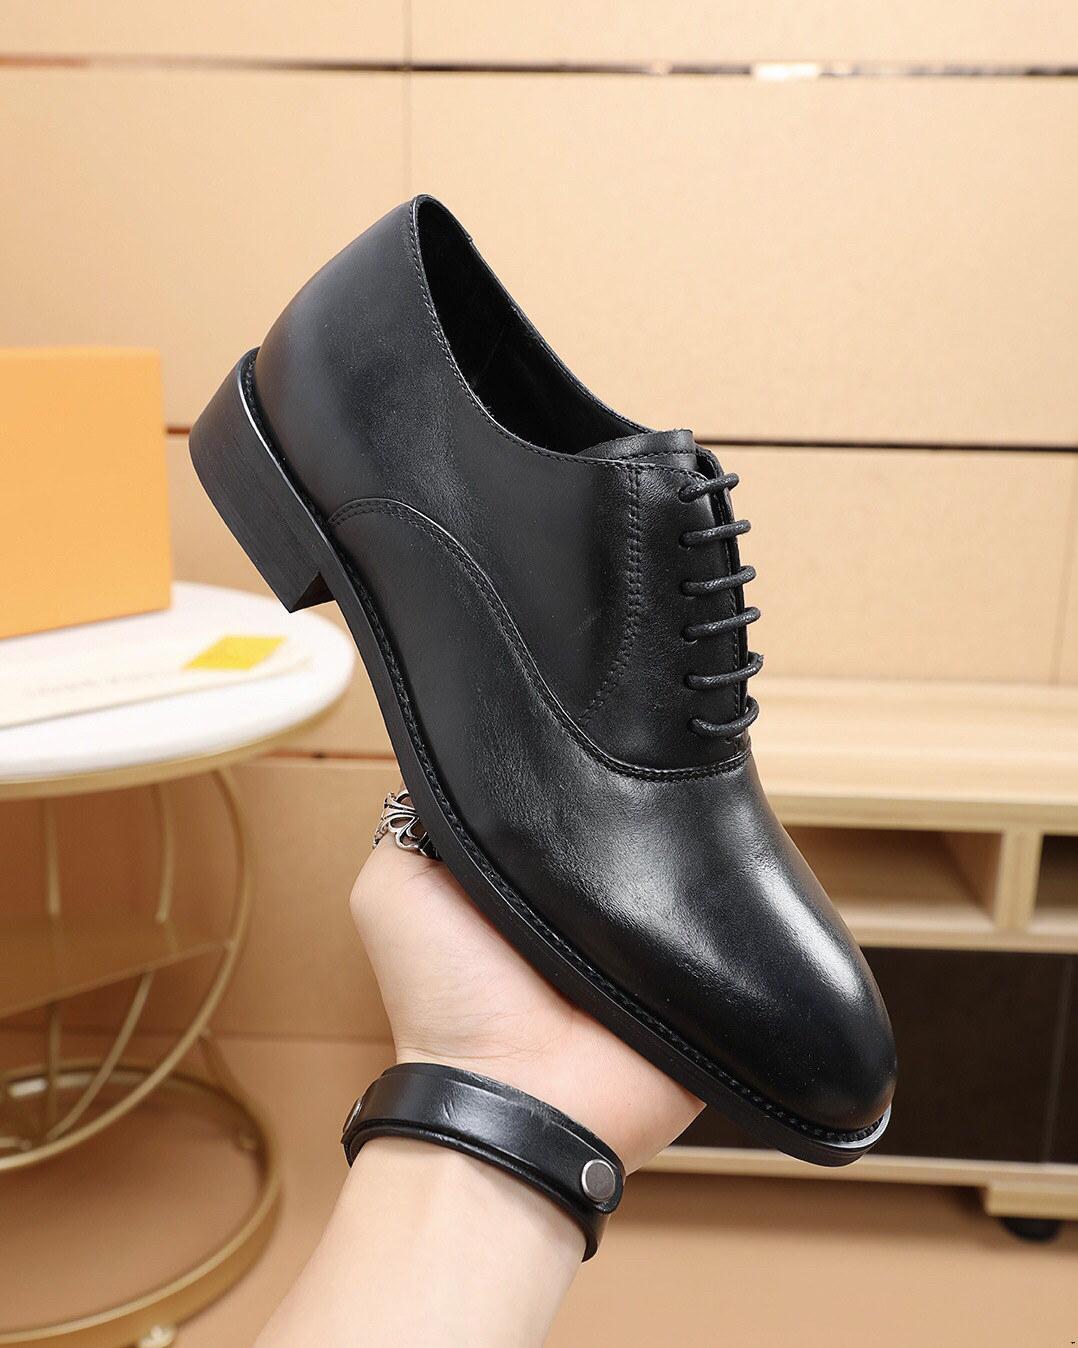 Hommes Véritable Wingtip Cuir Plateforme Oxford Chaussures de Prestige Designer pointu one-up Oxfords Robe Brogues Chaussures de mariage